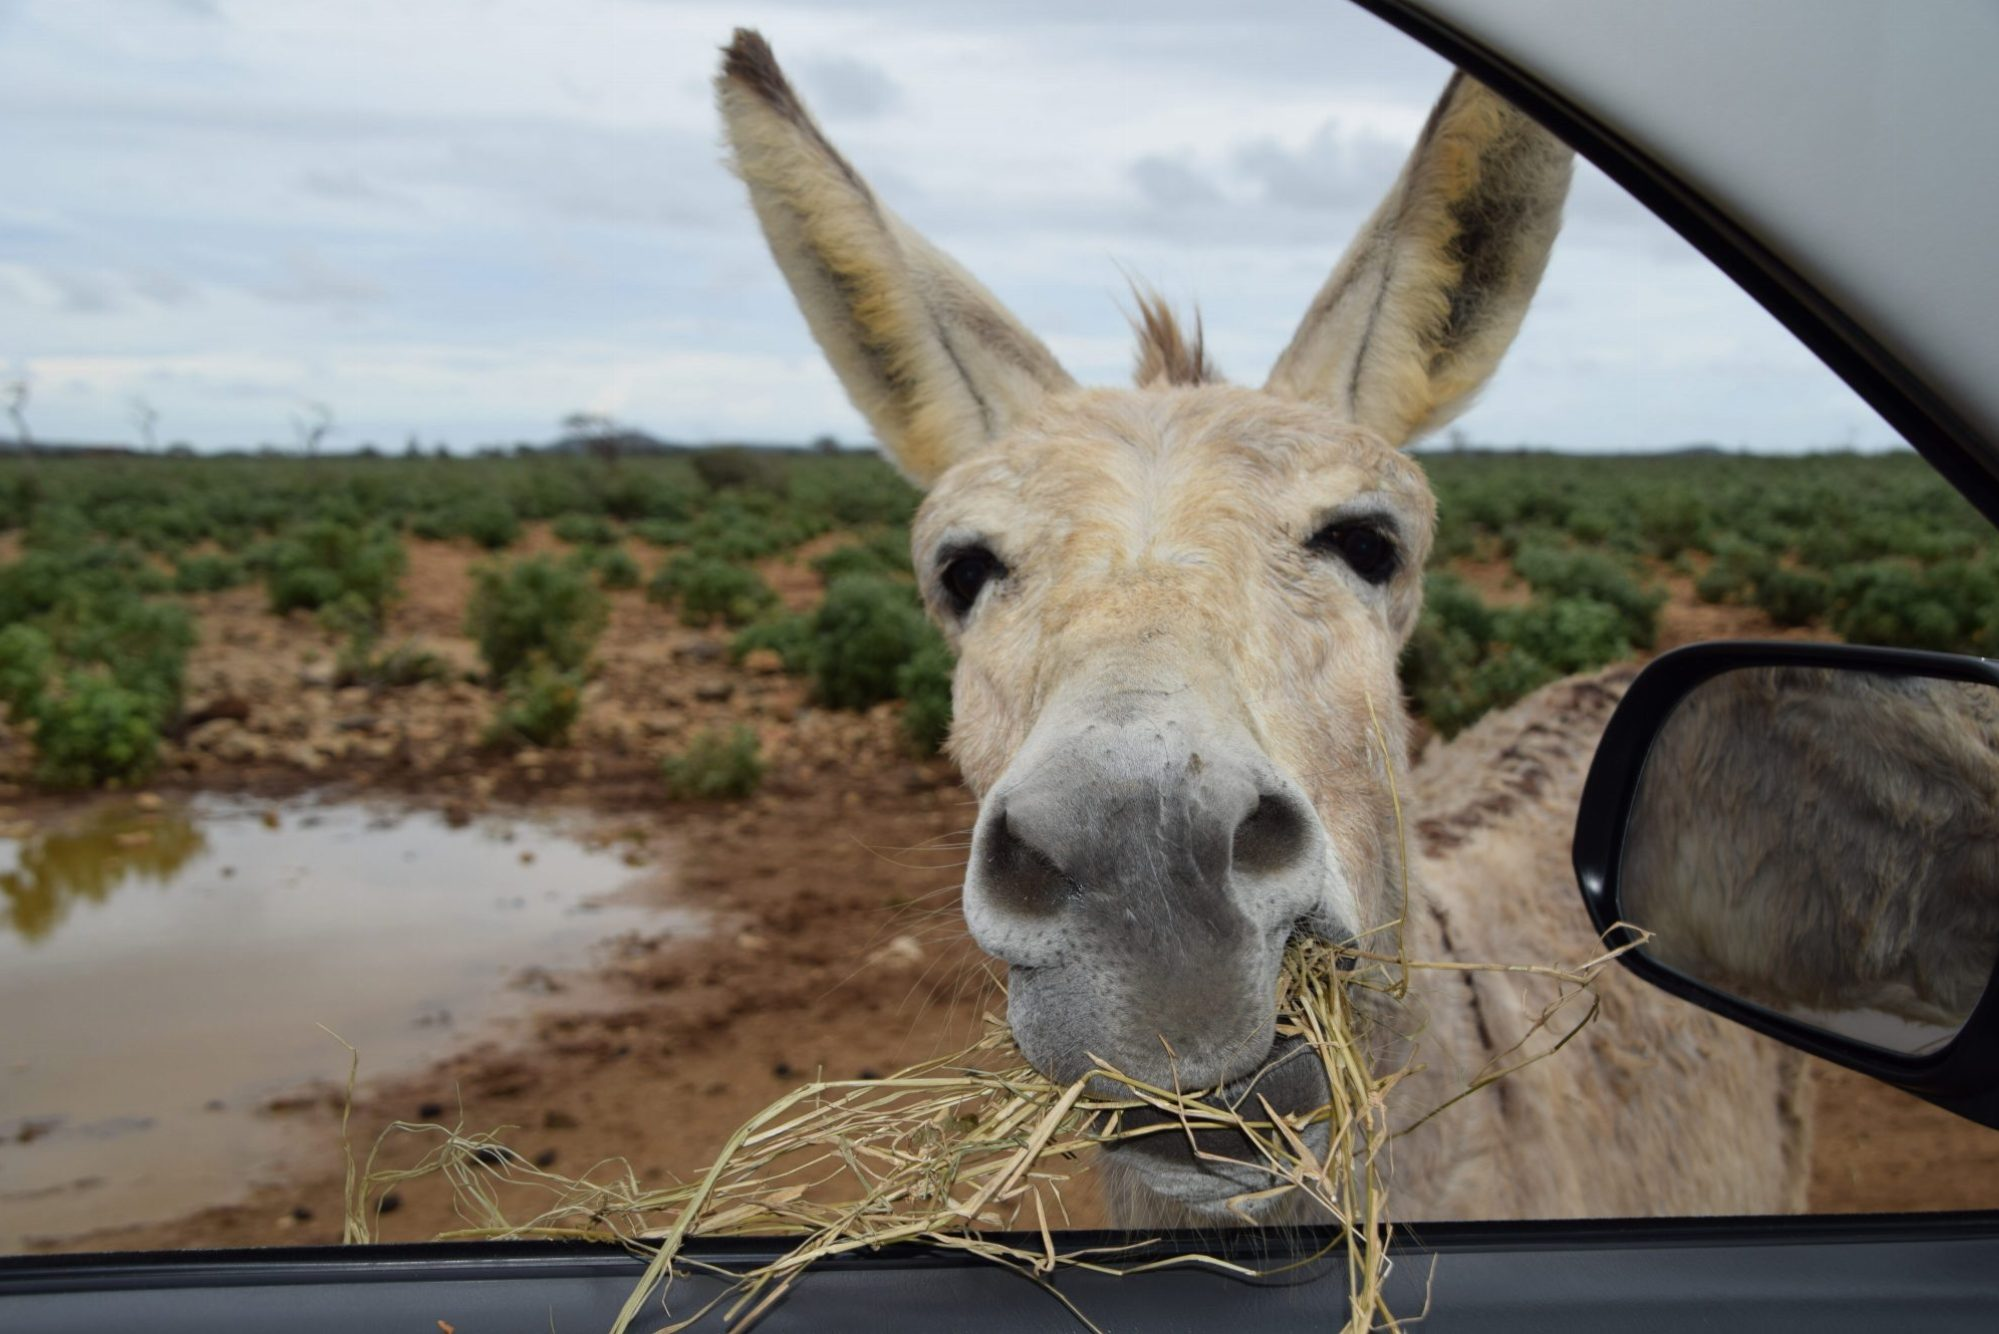 Visit the Donkey Sanctuary Bonaire